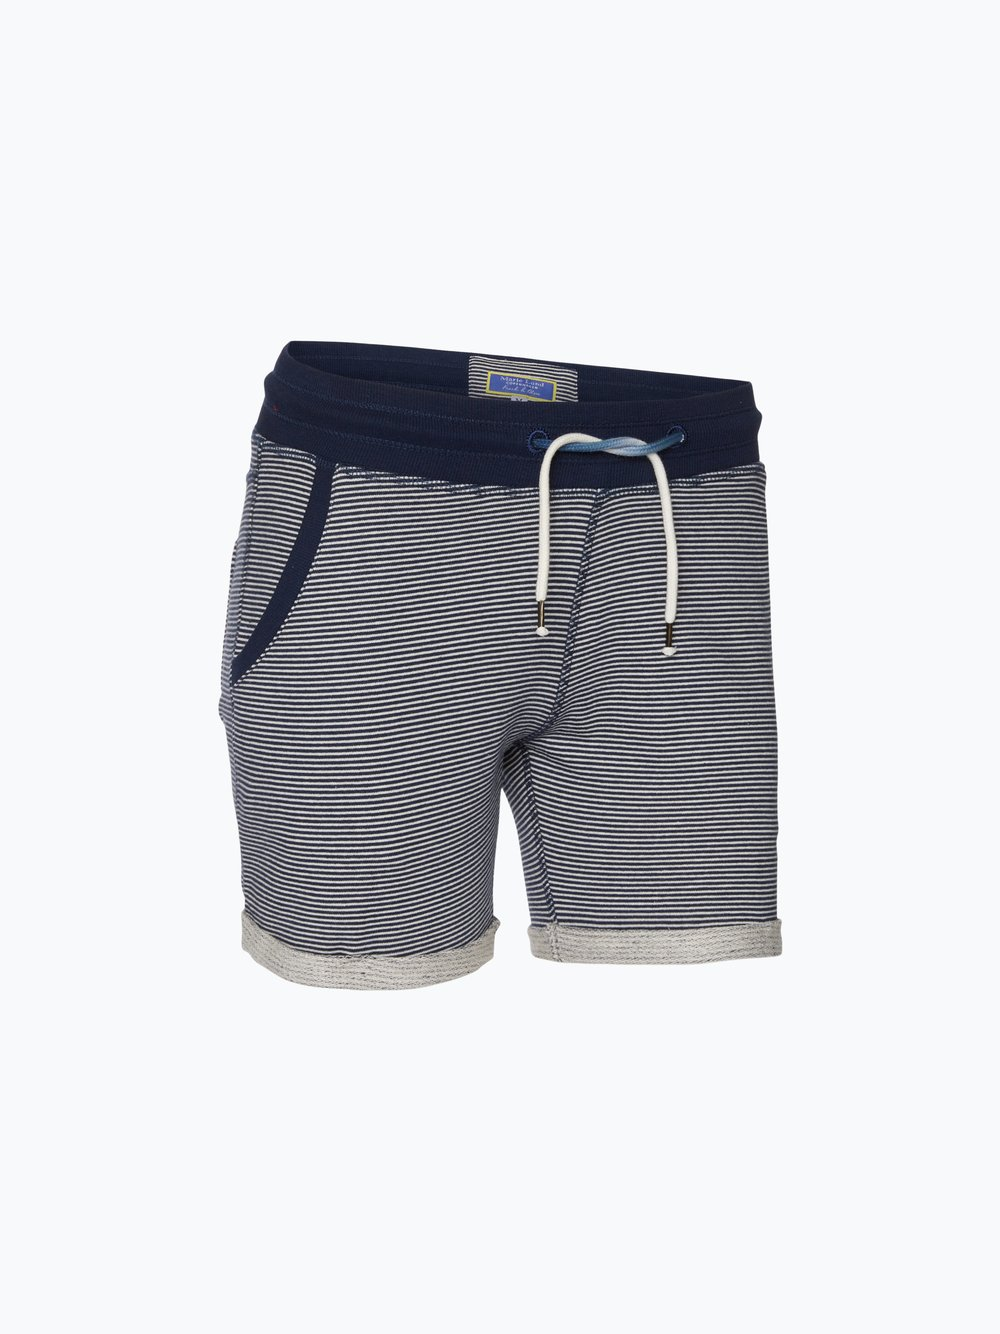 Marie Lund Damen Shorts - Fresh & Blue-0